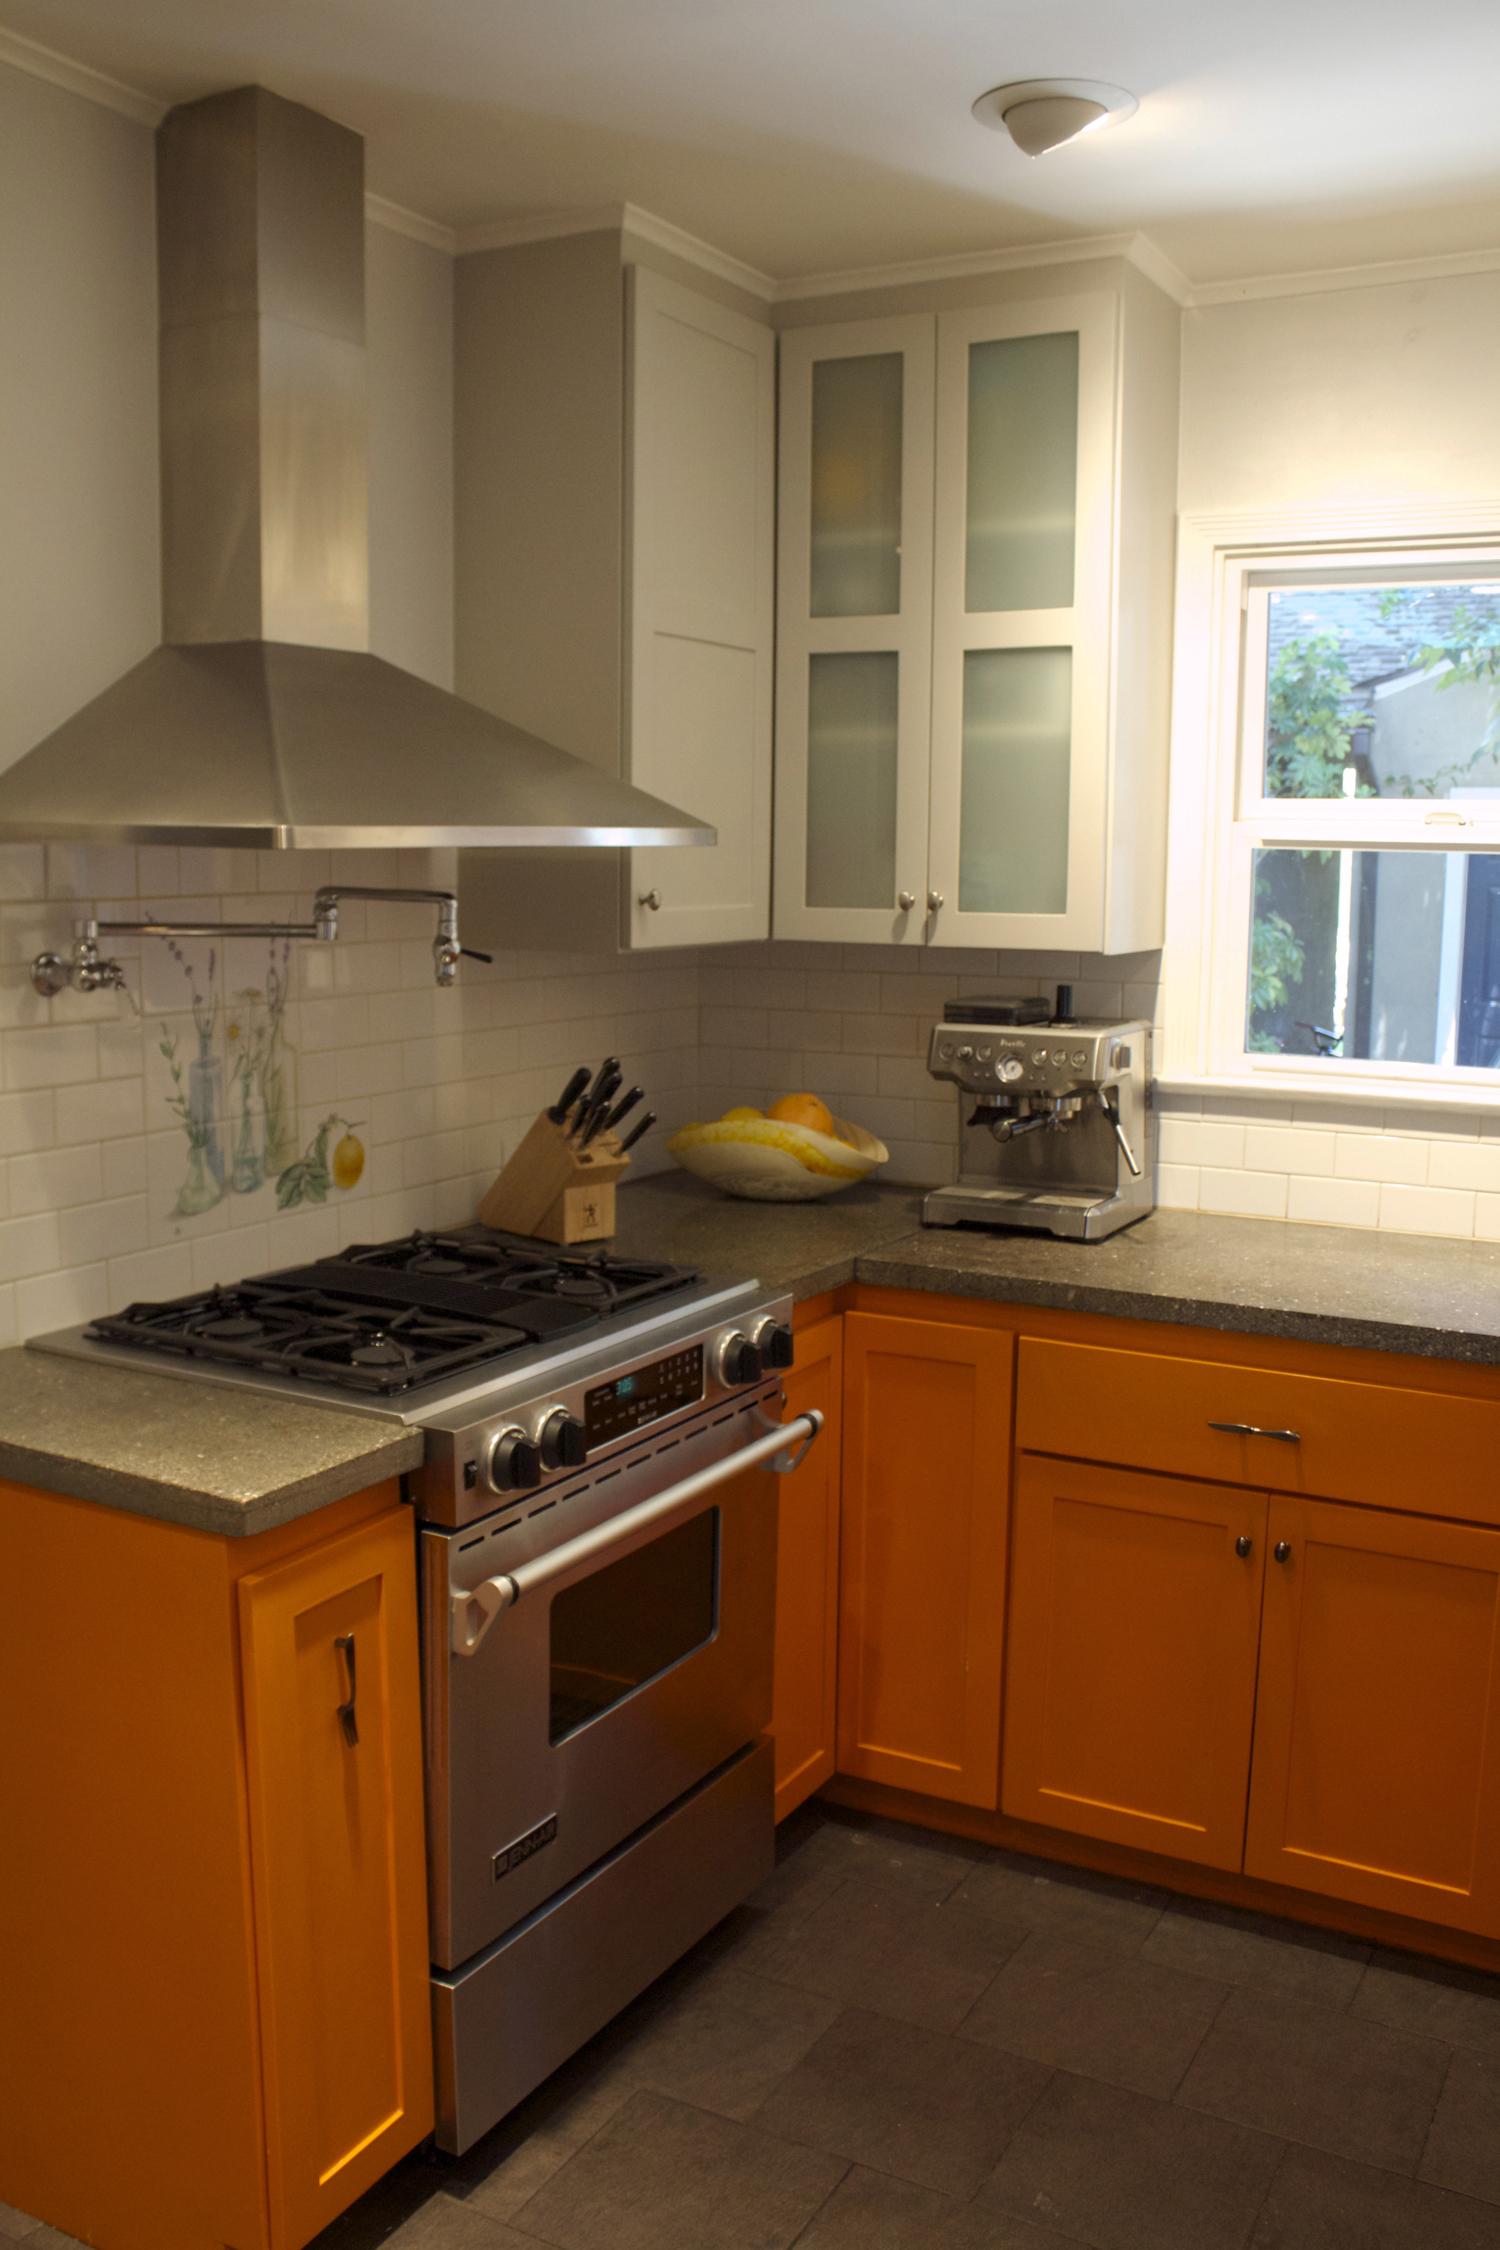 burbank kitchen2small.jpg